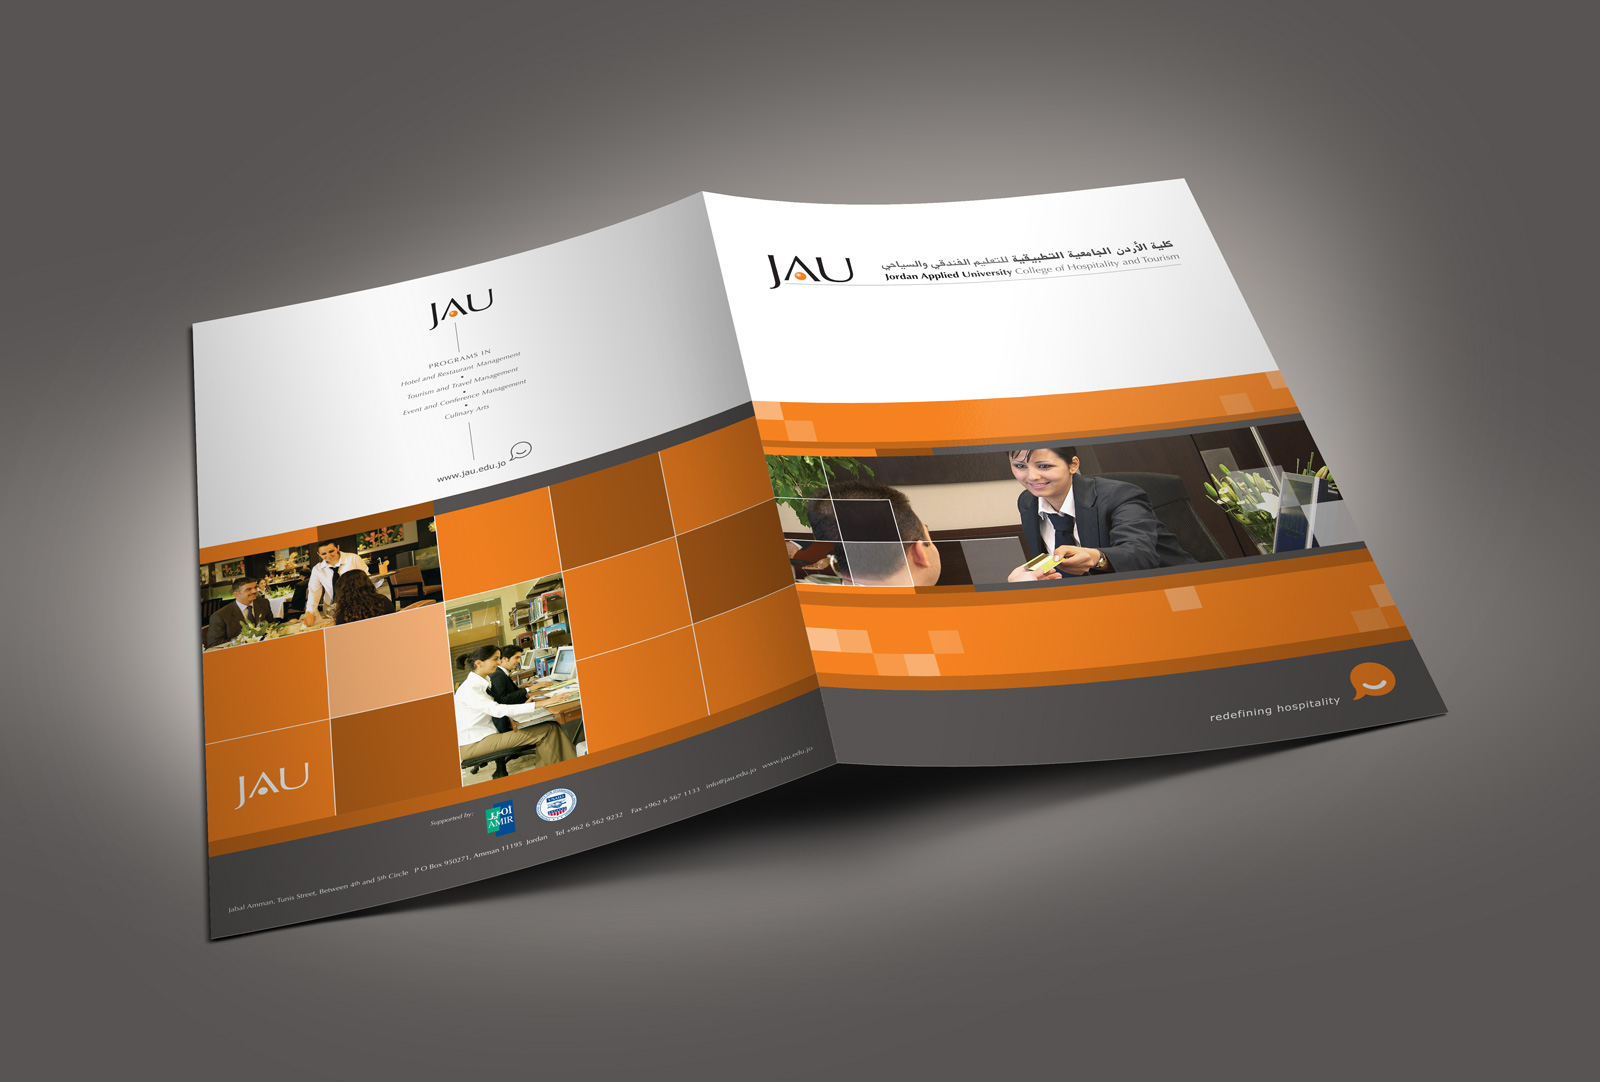 Jordan Applied University (JAU) branding design by Creations.